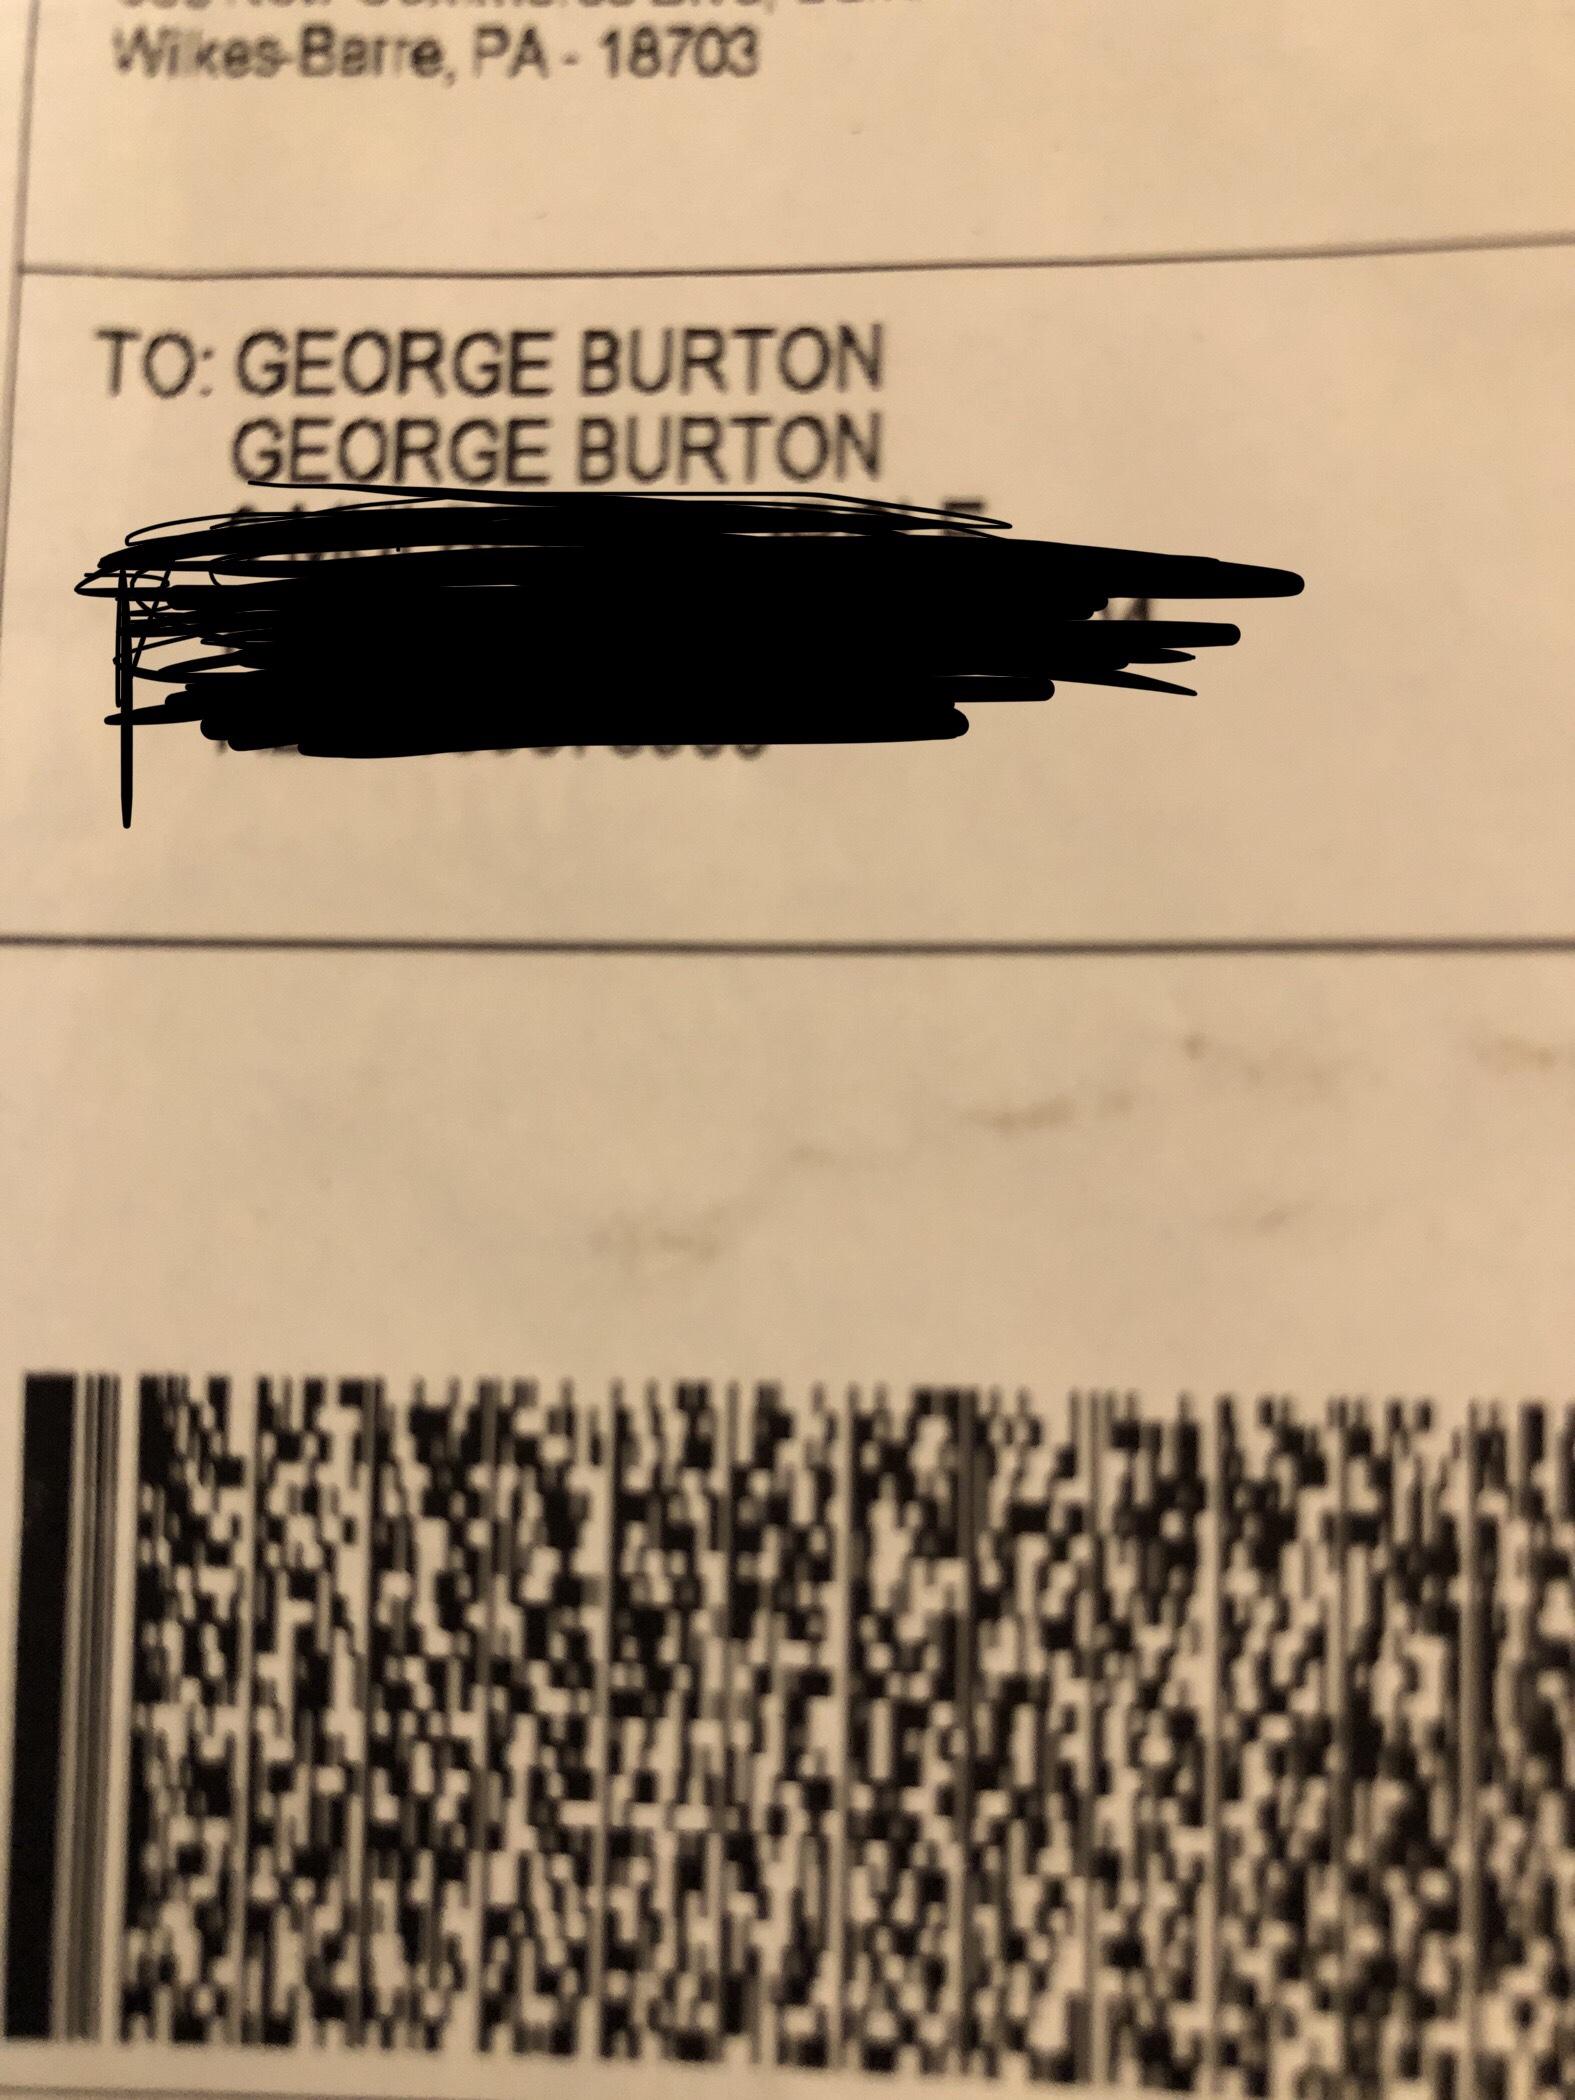 Envelope addressed to George burton